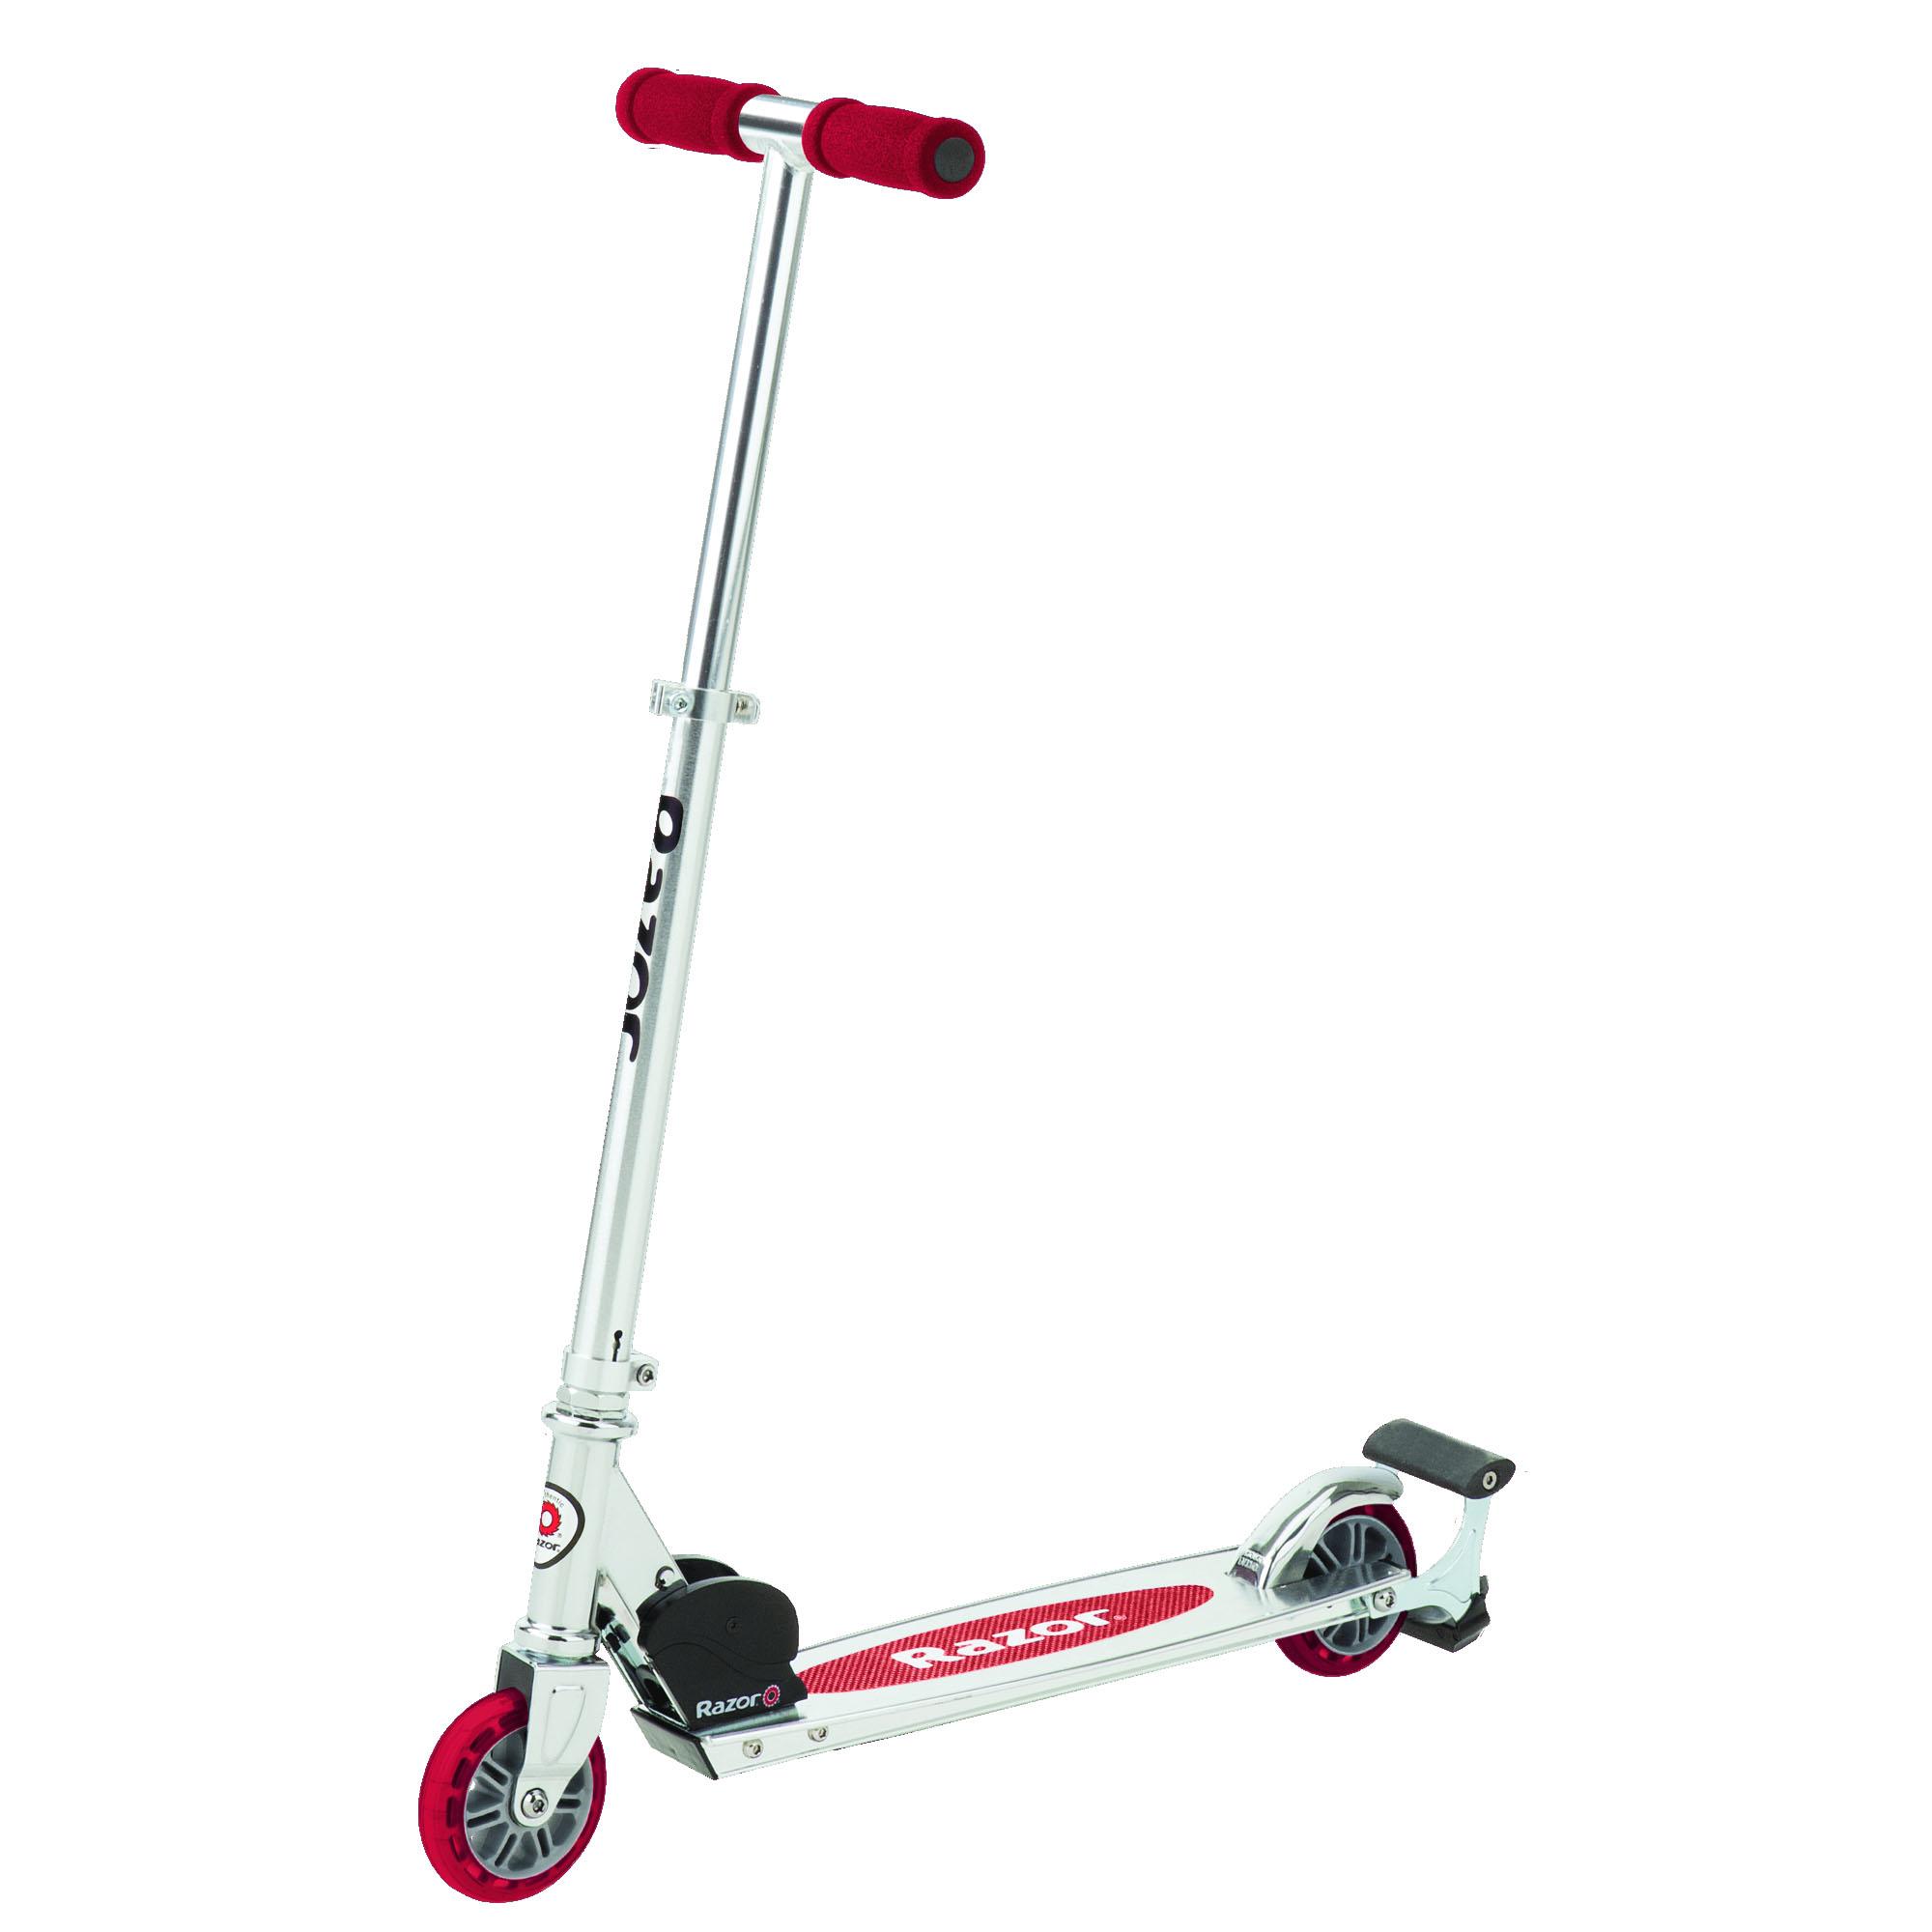 Razor Spark Kick Scooter Parts